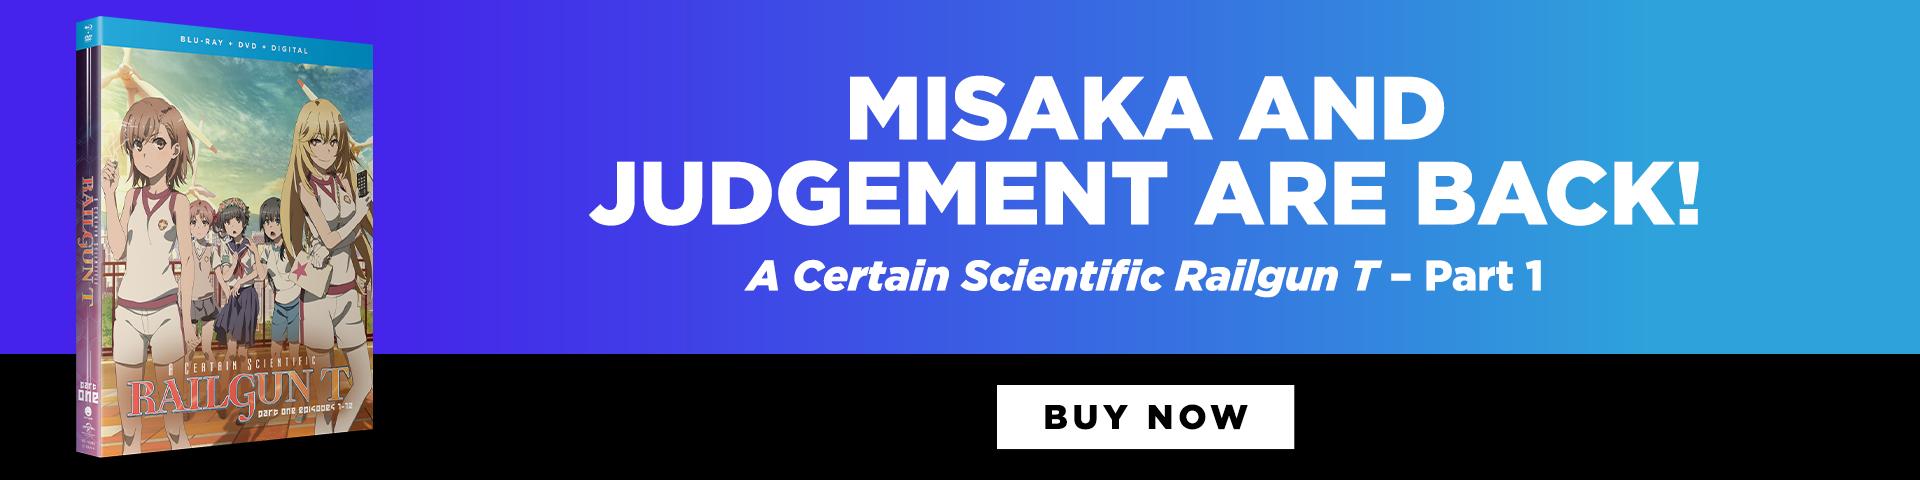 Misaka and Judgement are back! A Certain Scientific Railgun T - Part 1